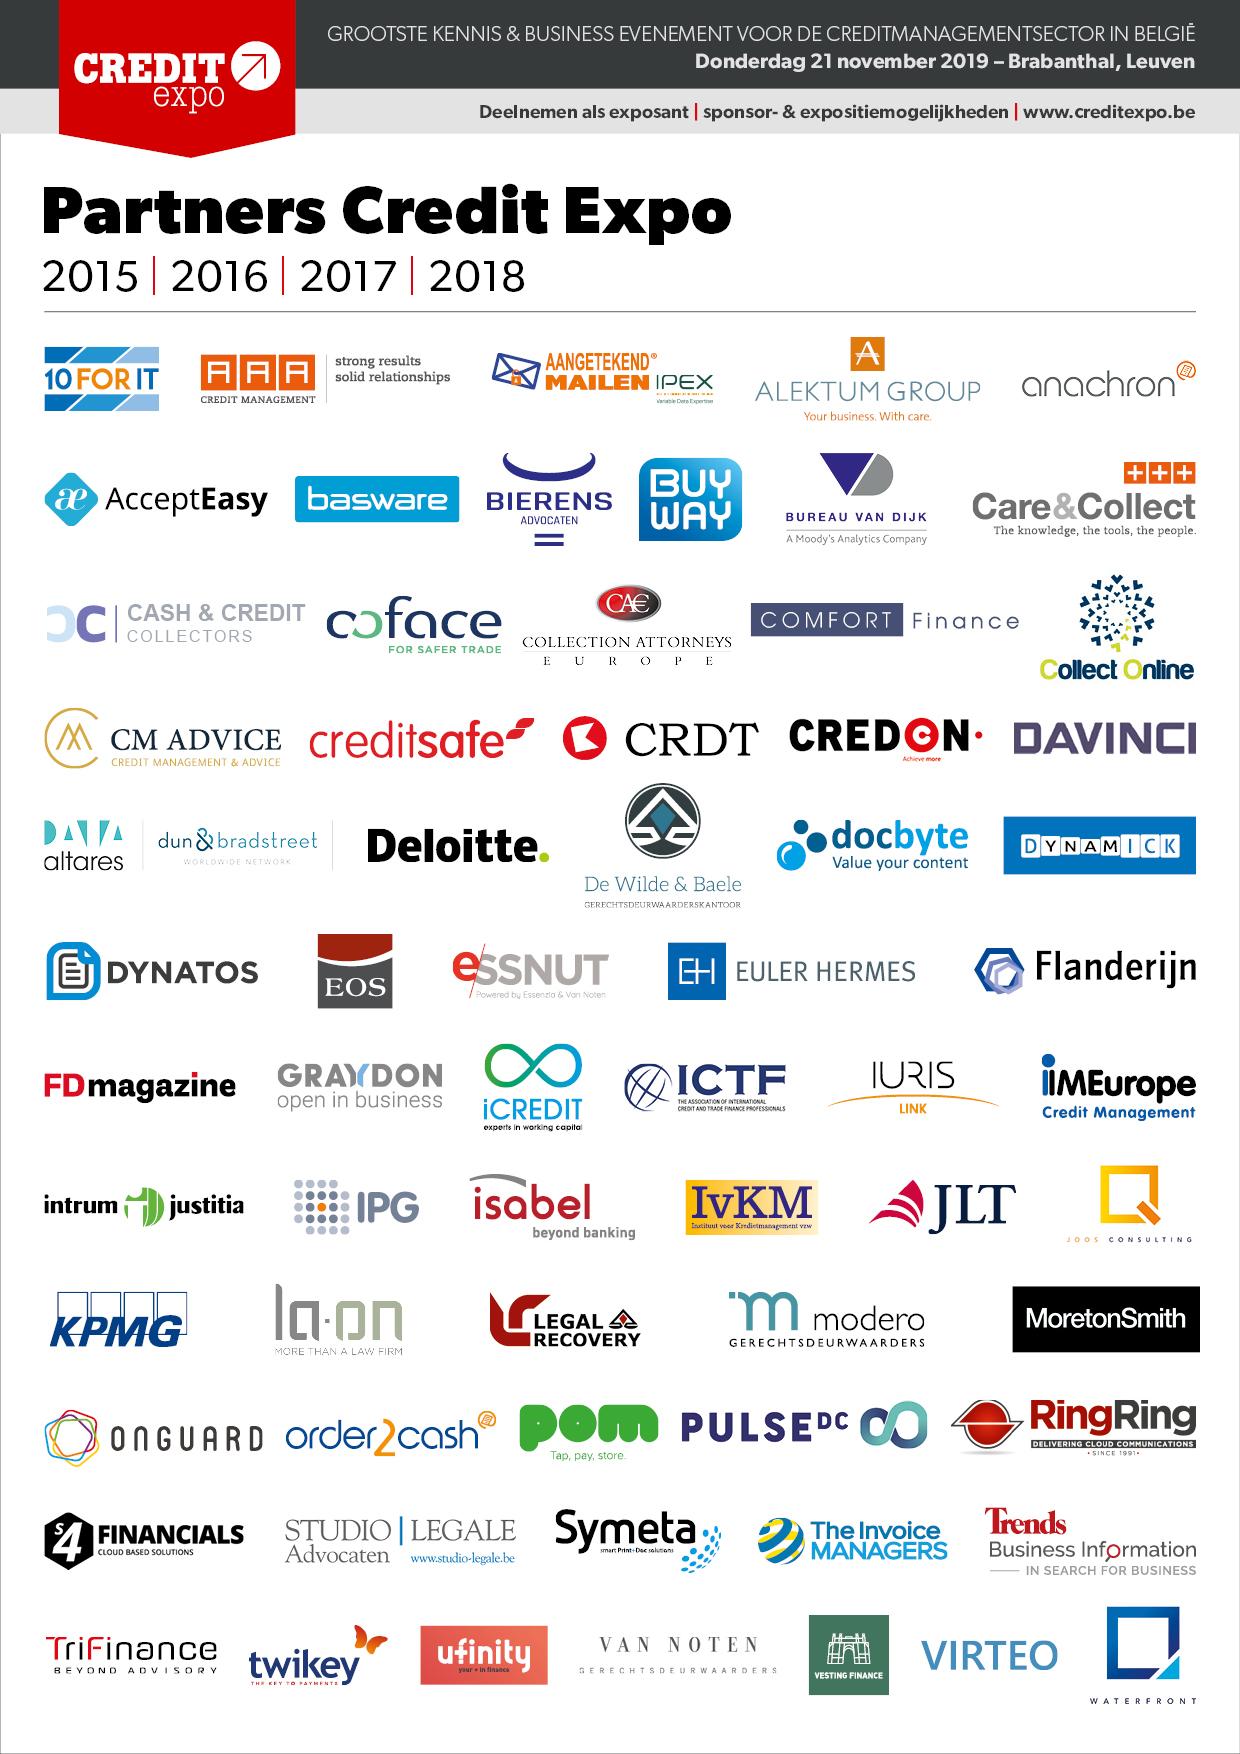 Credit Expo Belgium - partners.jpg